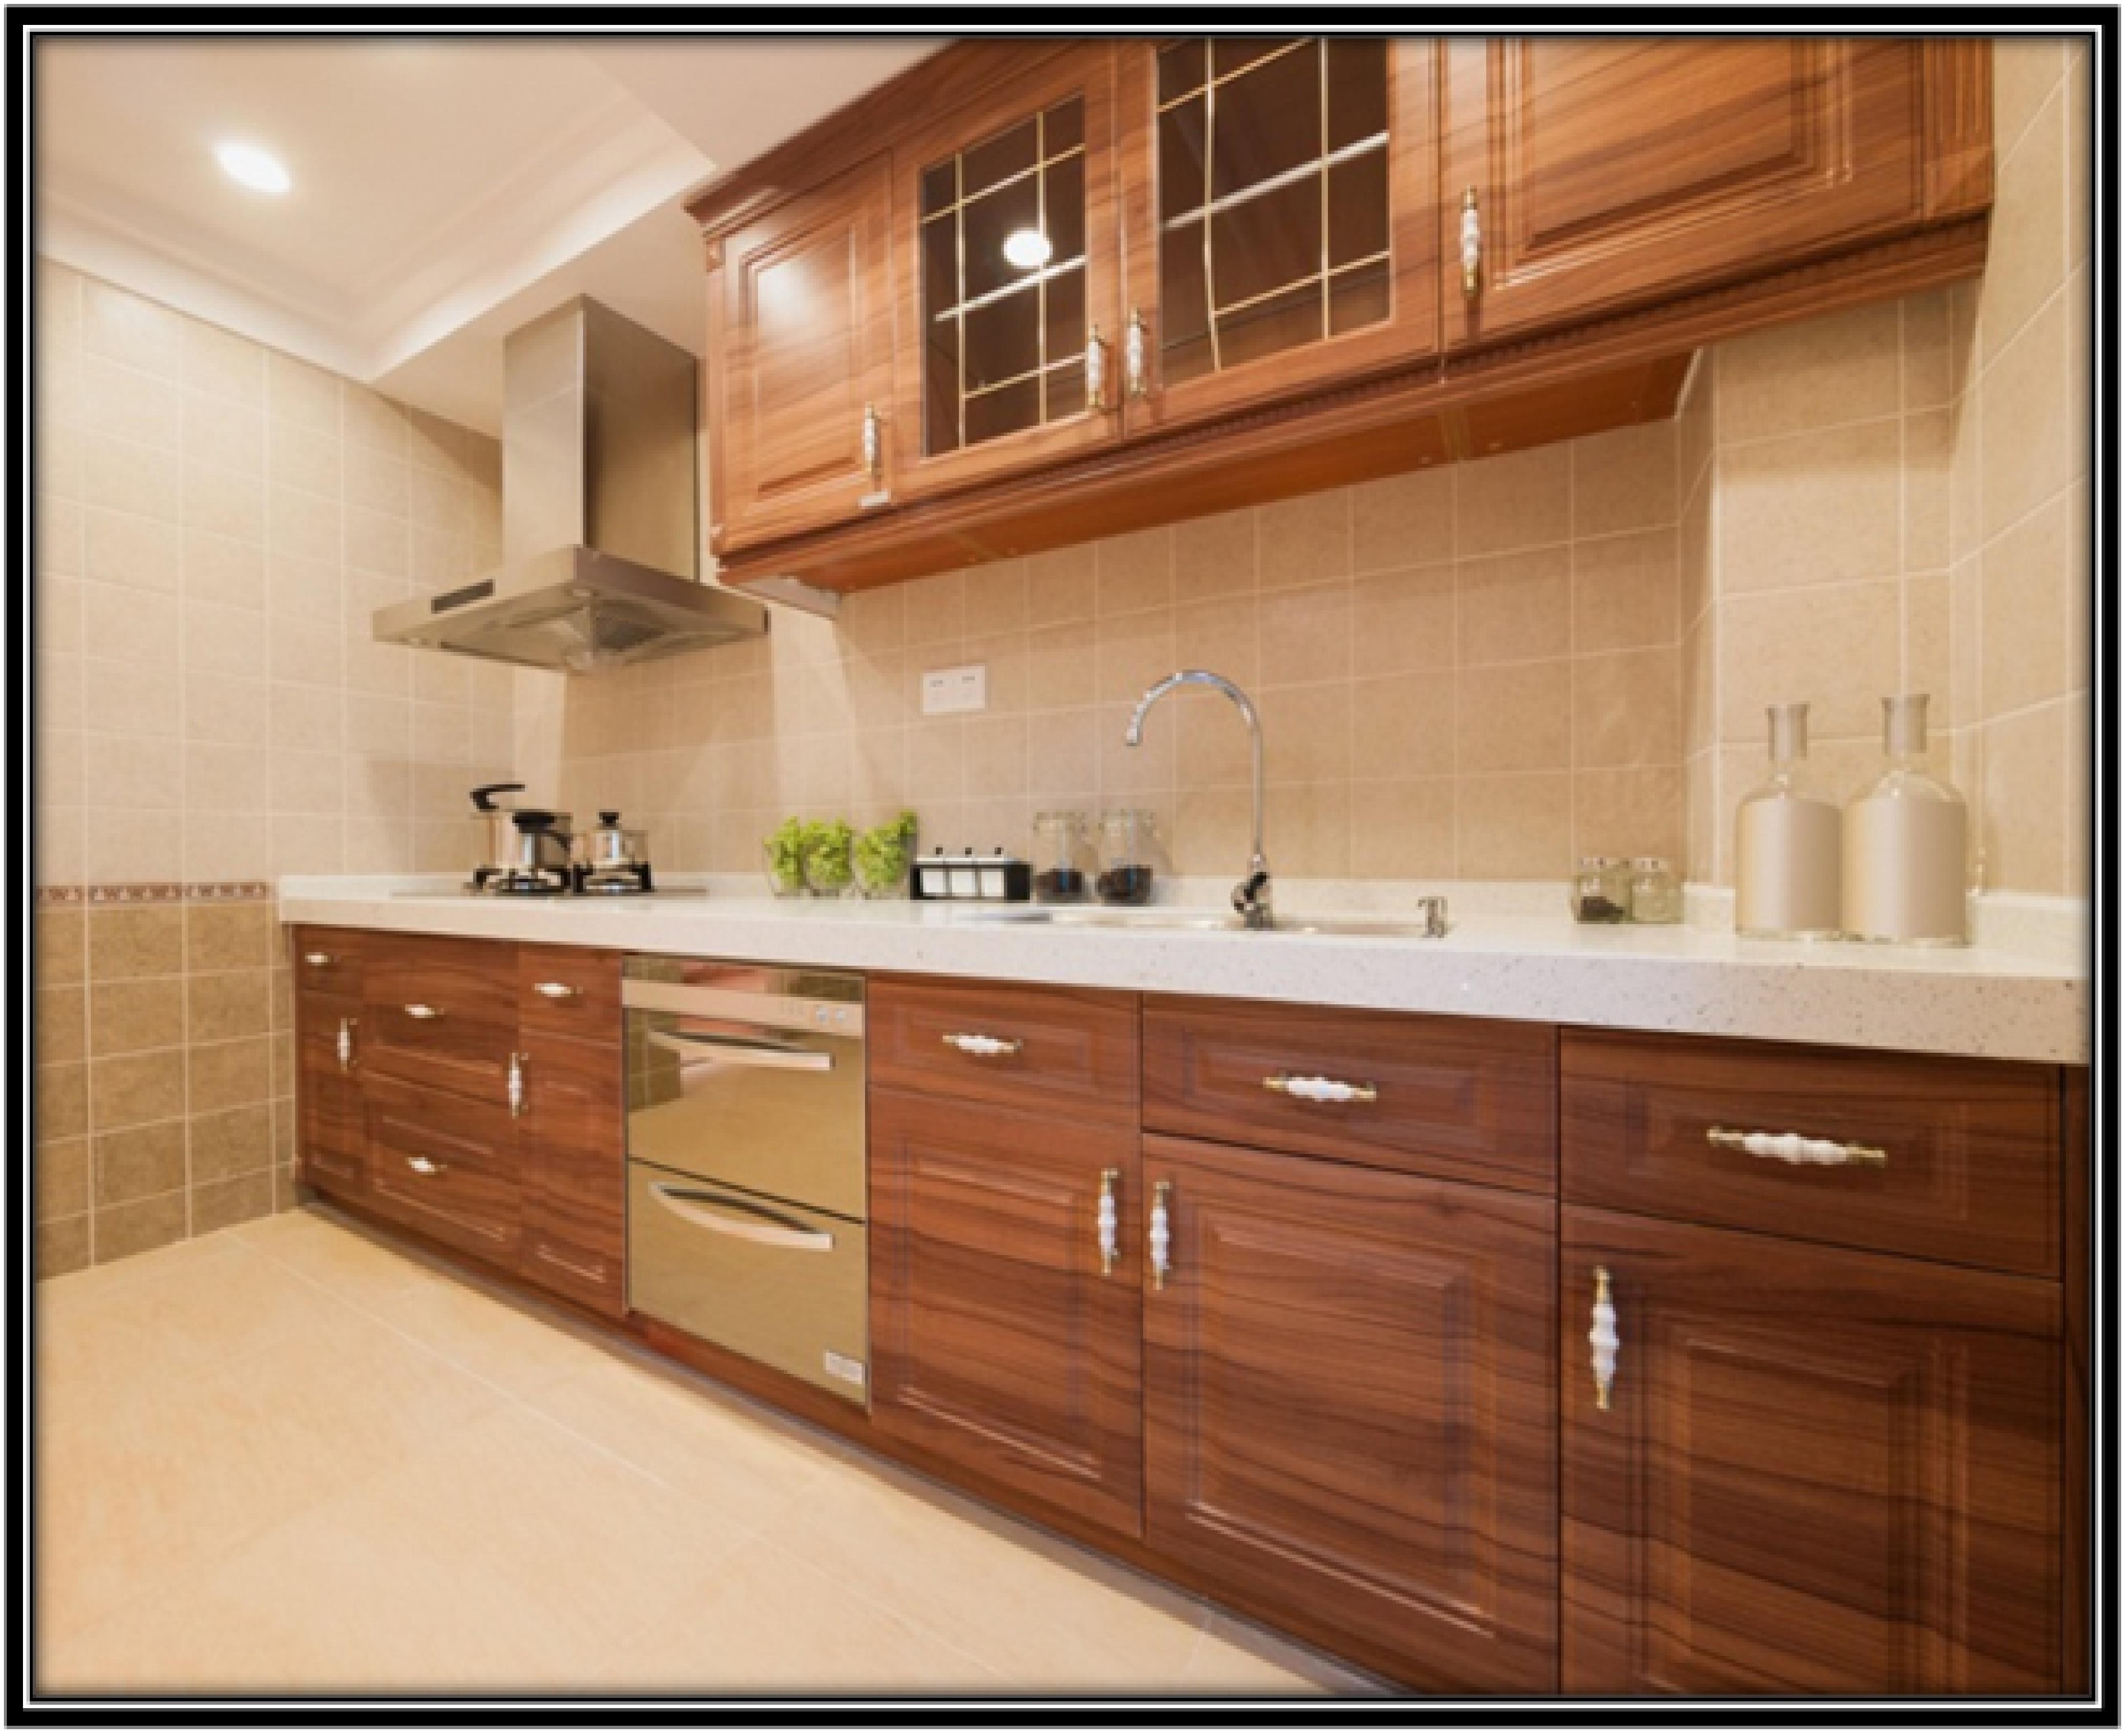 Kitchen Furniture Ideas - Home Decor Ideas